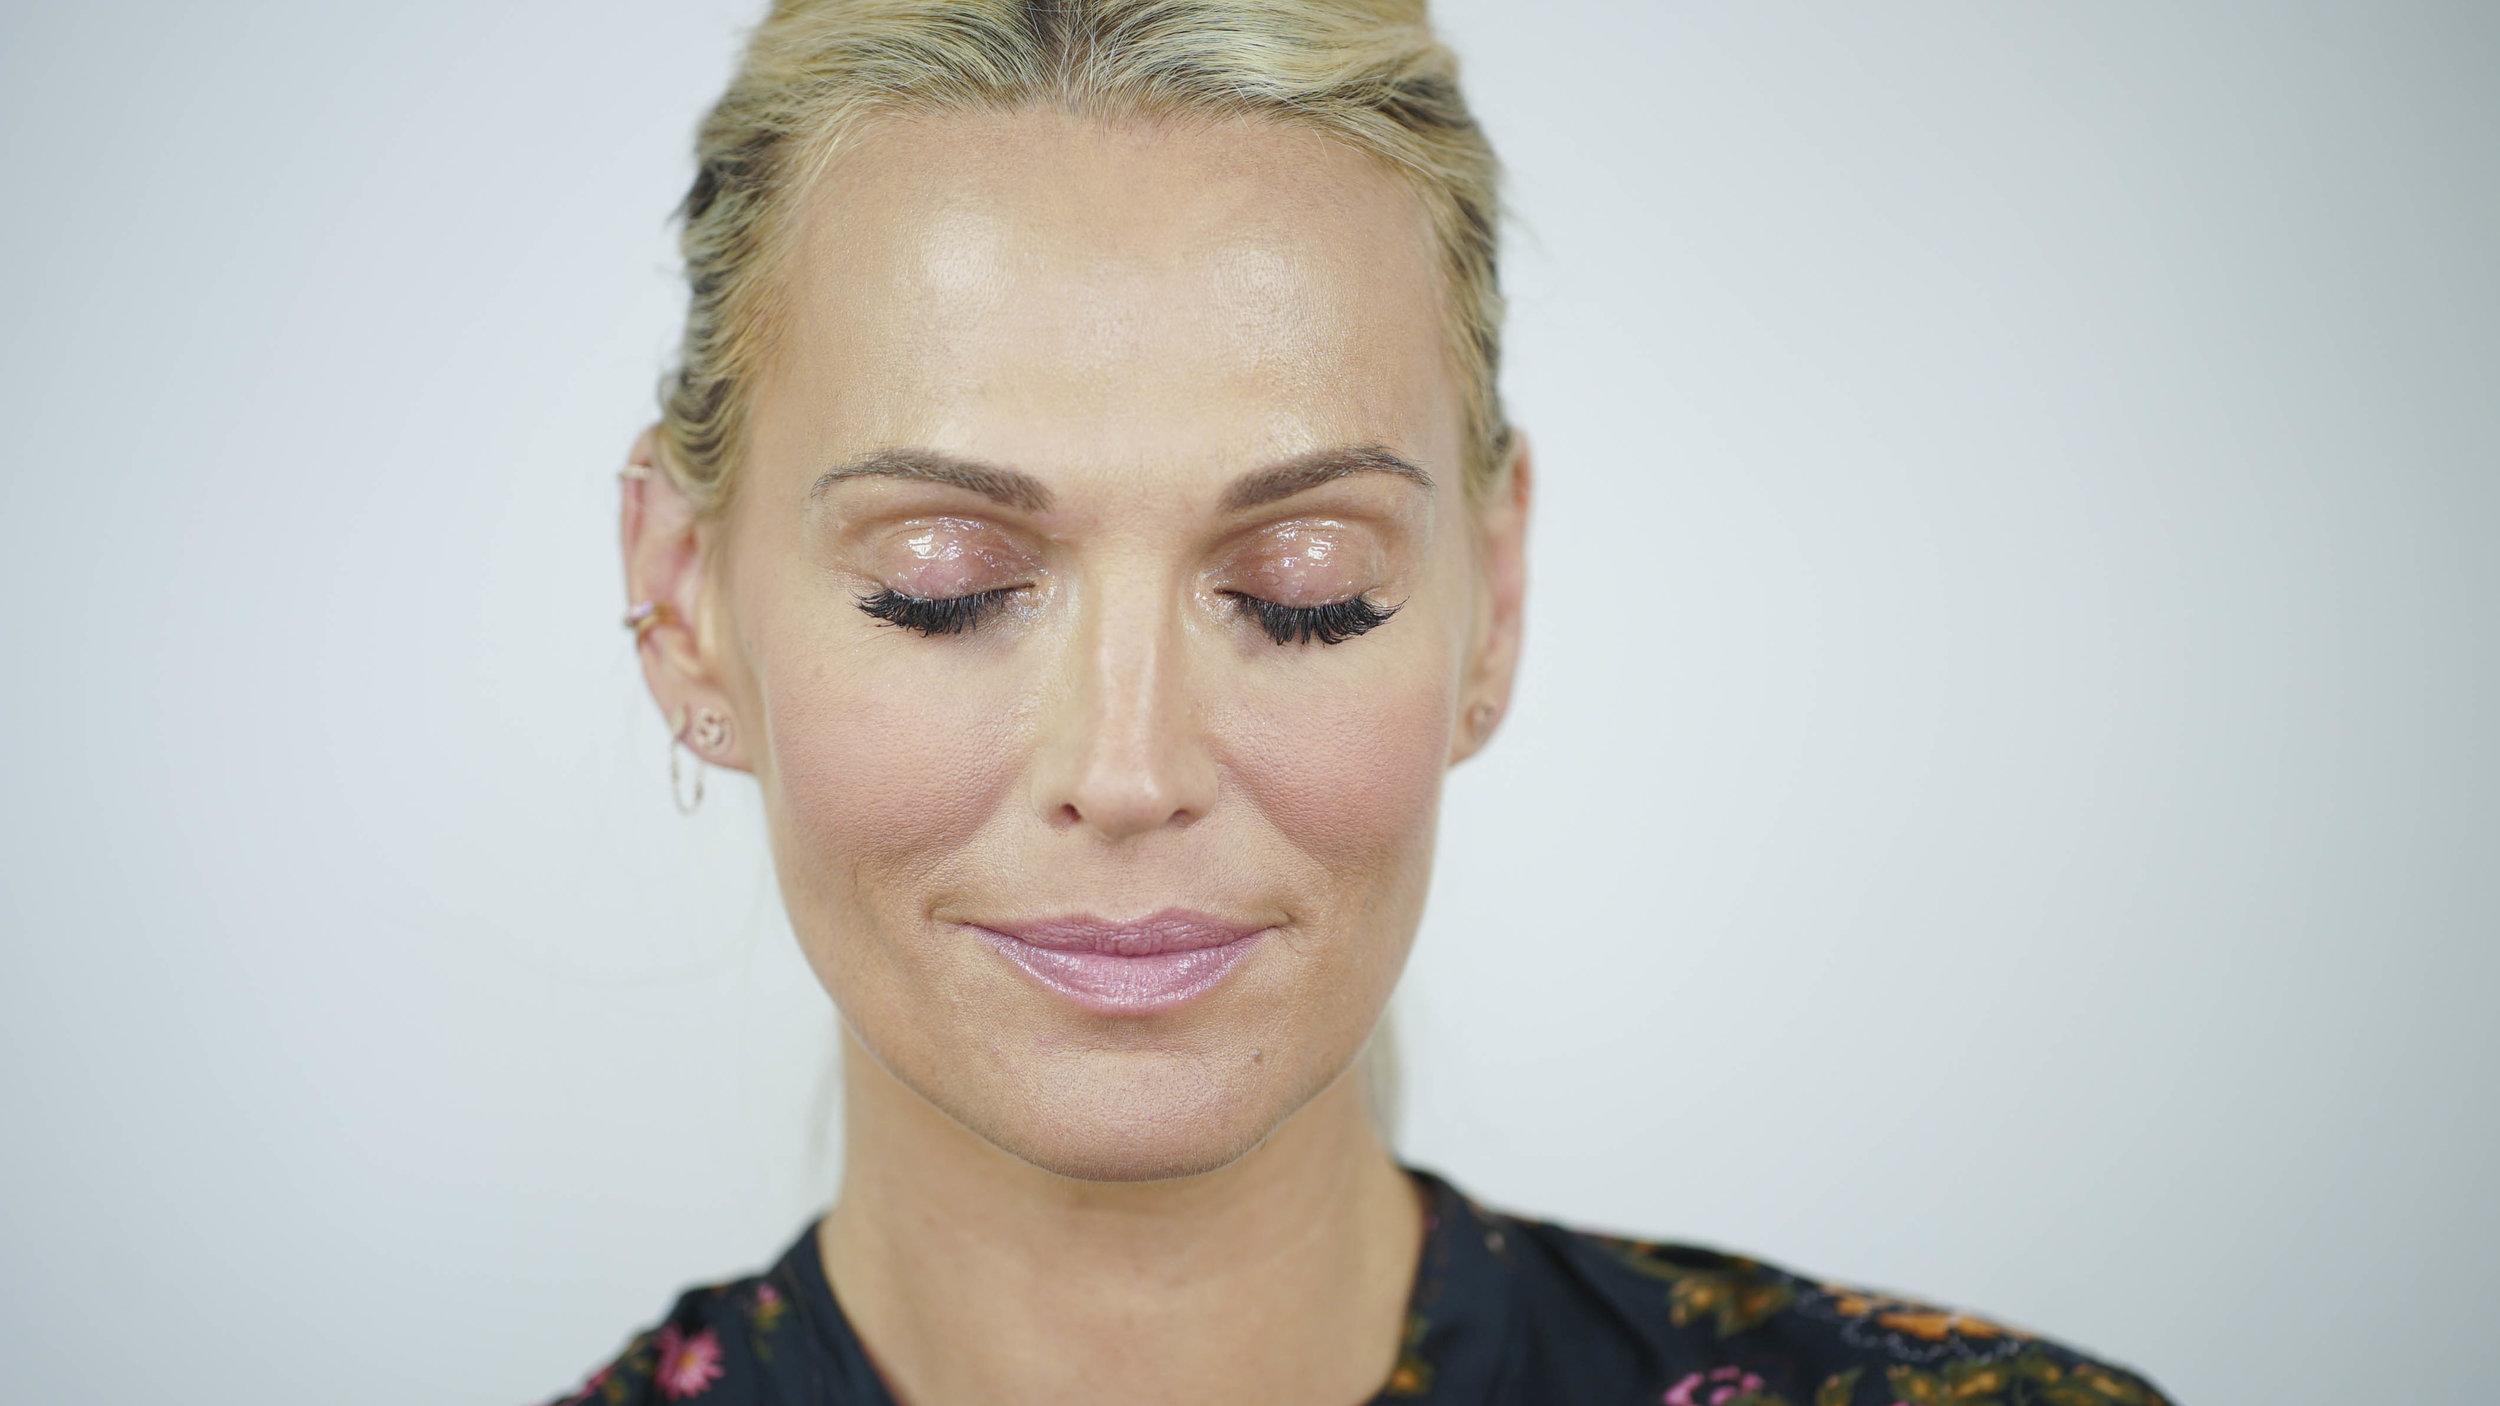 VIDEO: Glossy Lid Makeup Tutorial